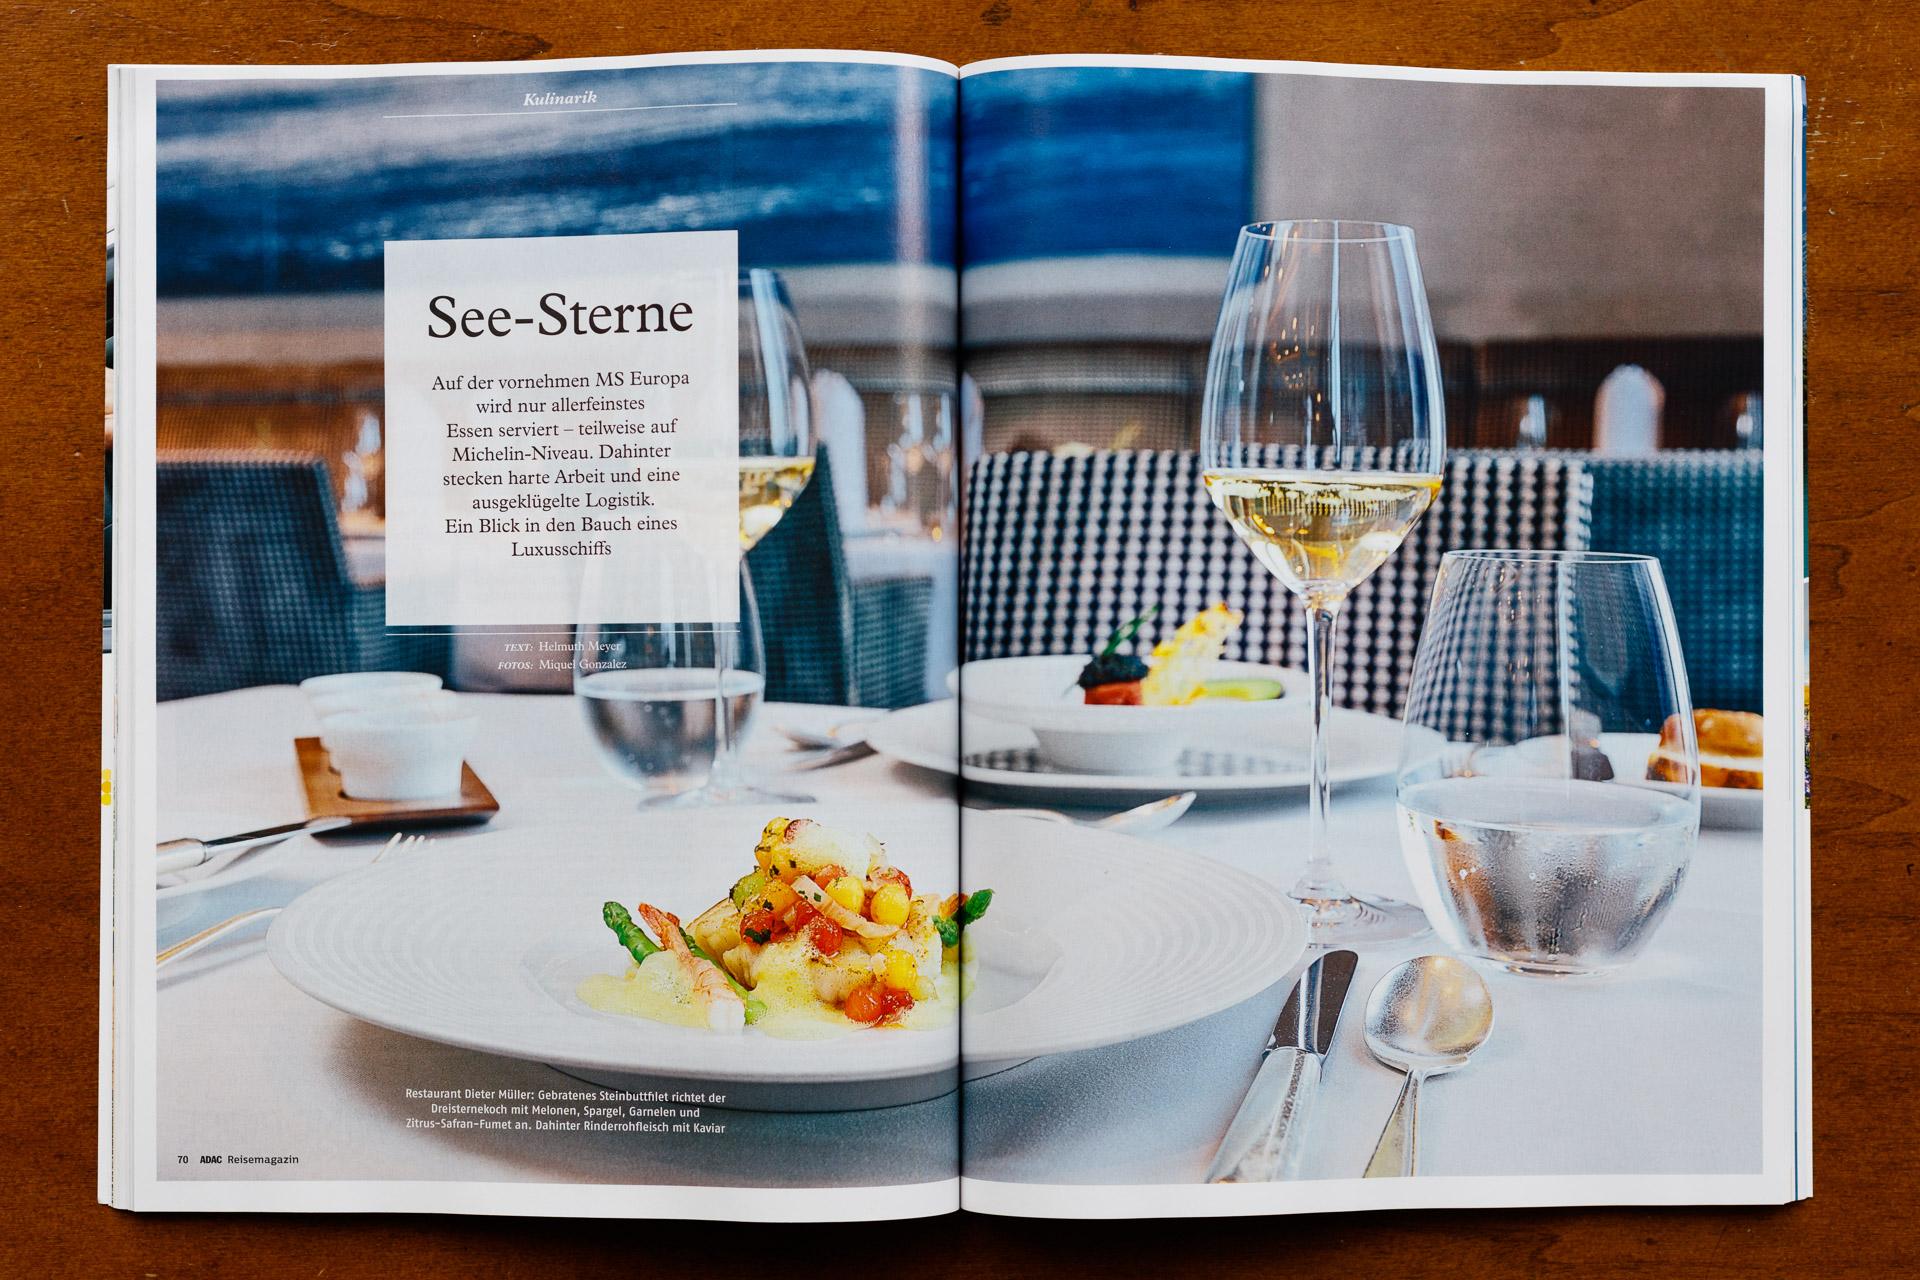 Culinary Photography